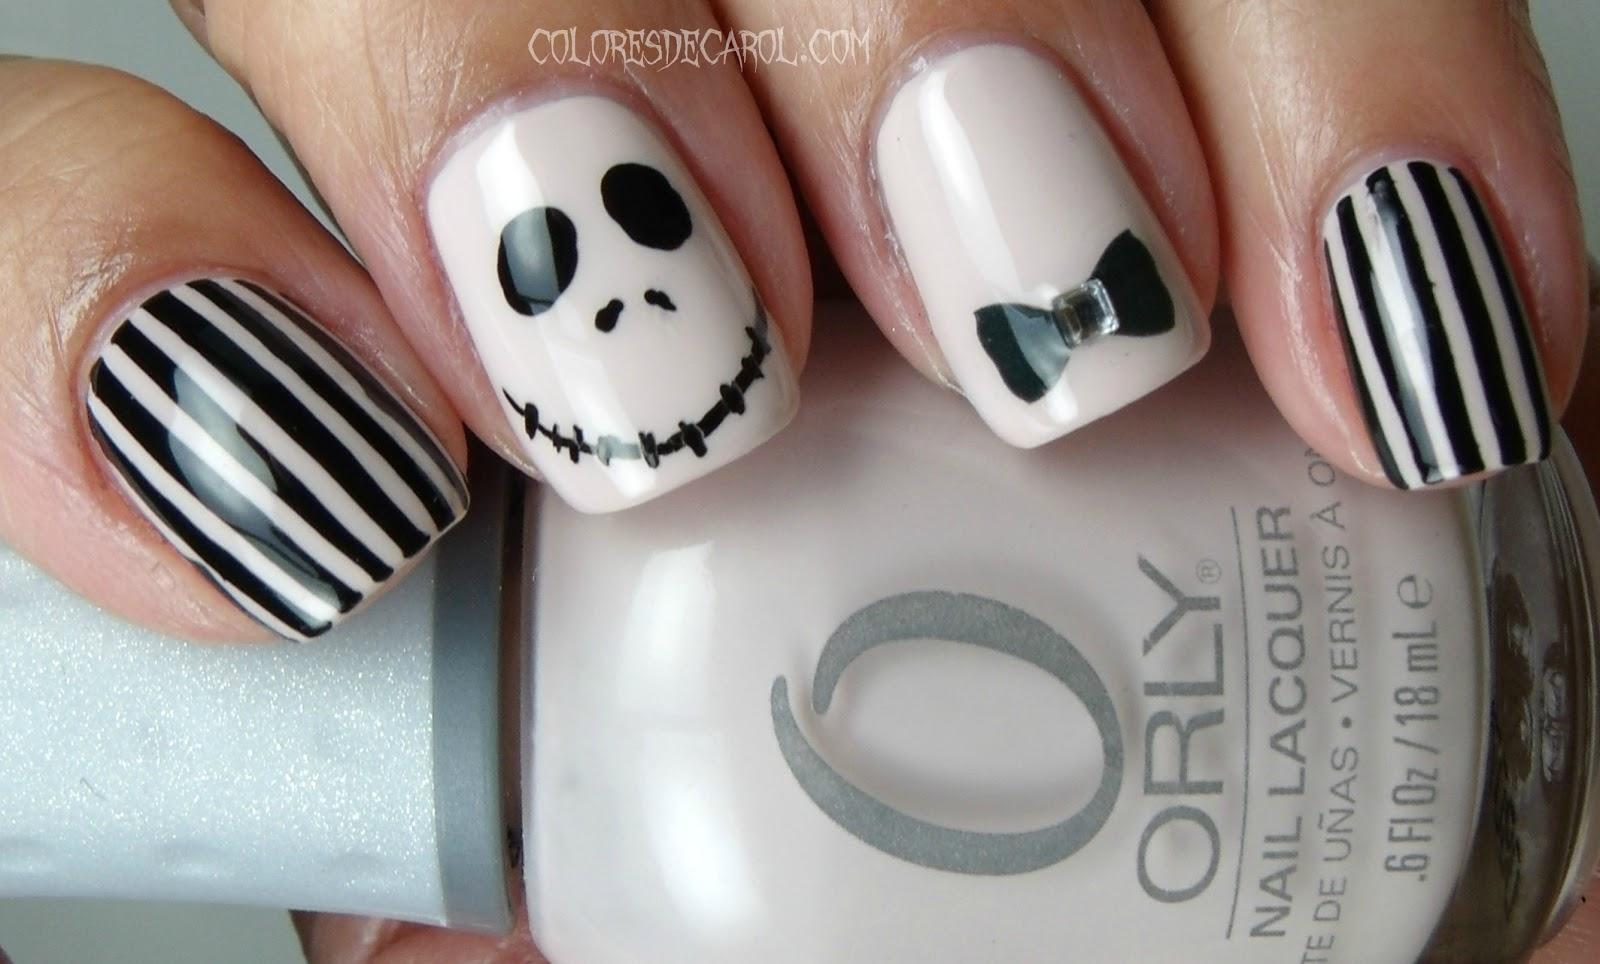 Colores de Carol: Jack Skellington - Halloween Manicure